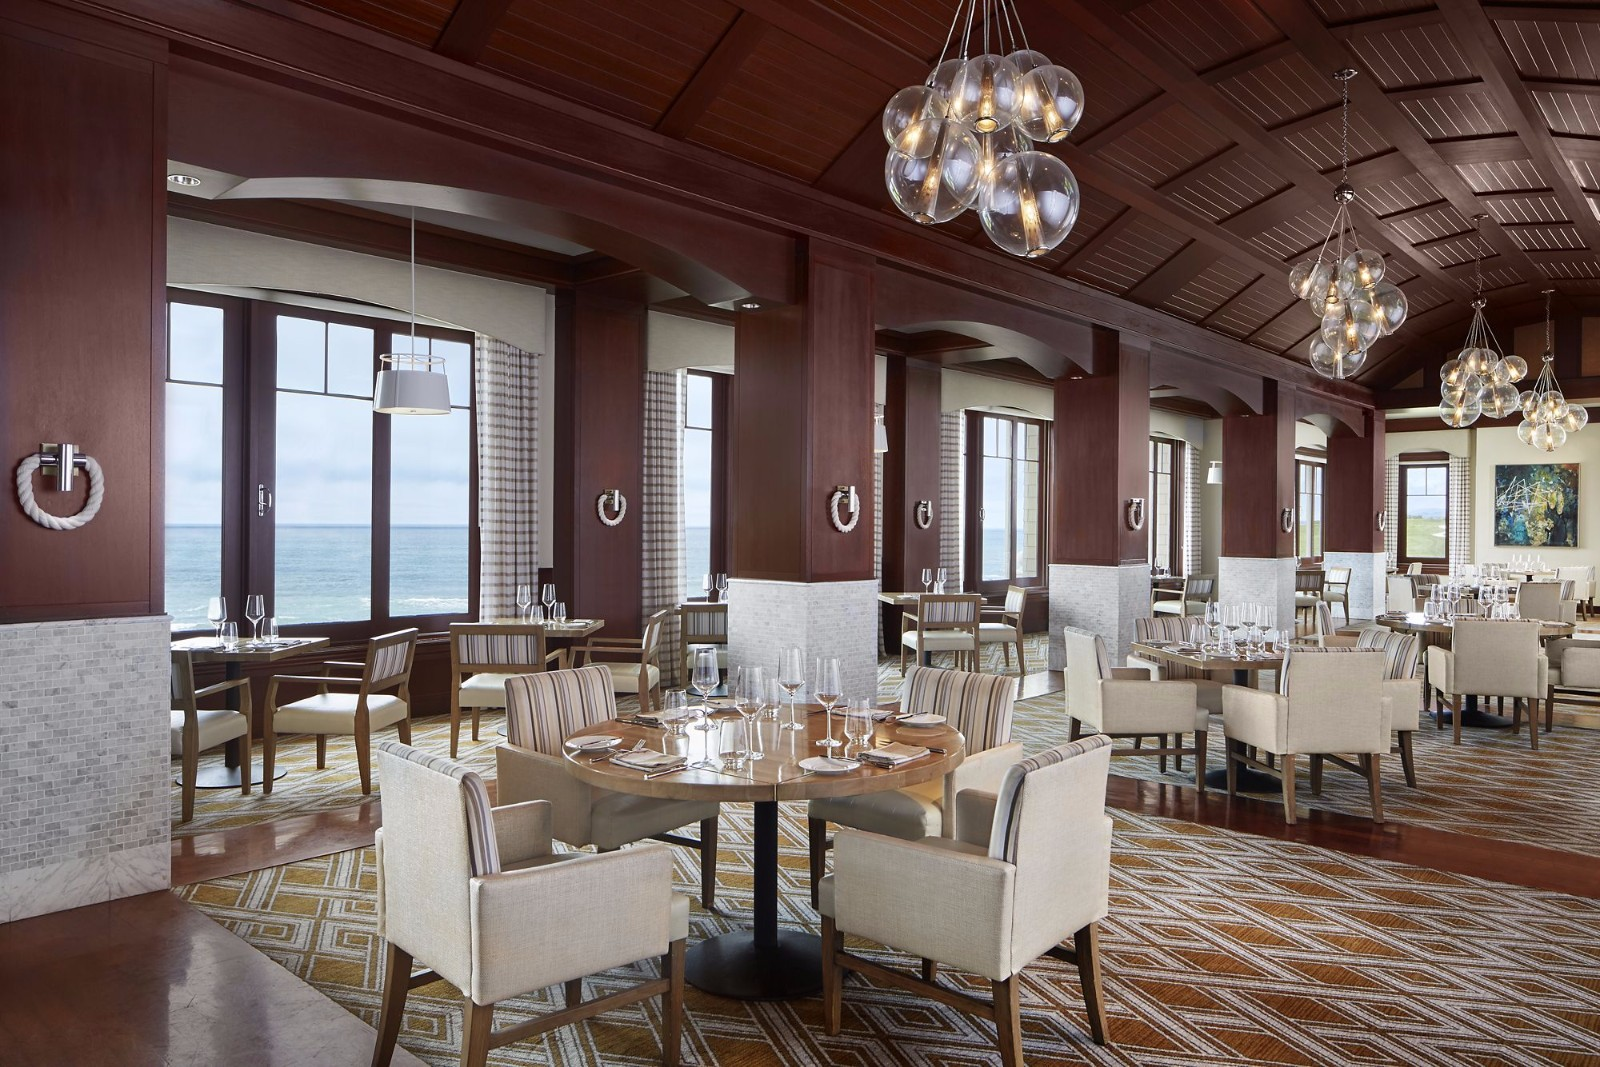 YSK Furniture modern style luxury restaurant furniture high quality restaurant furniture-1